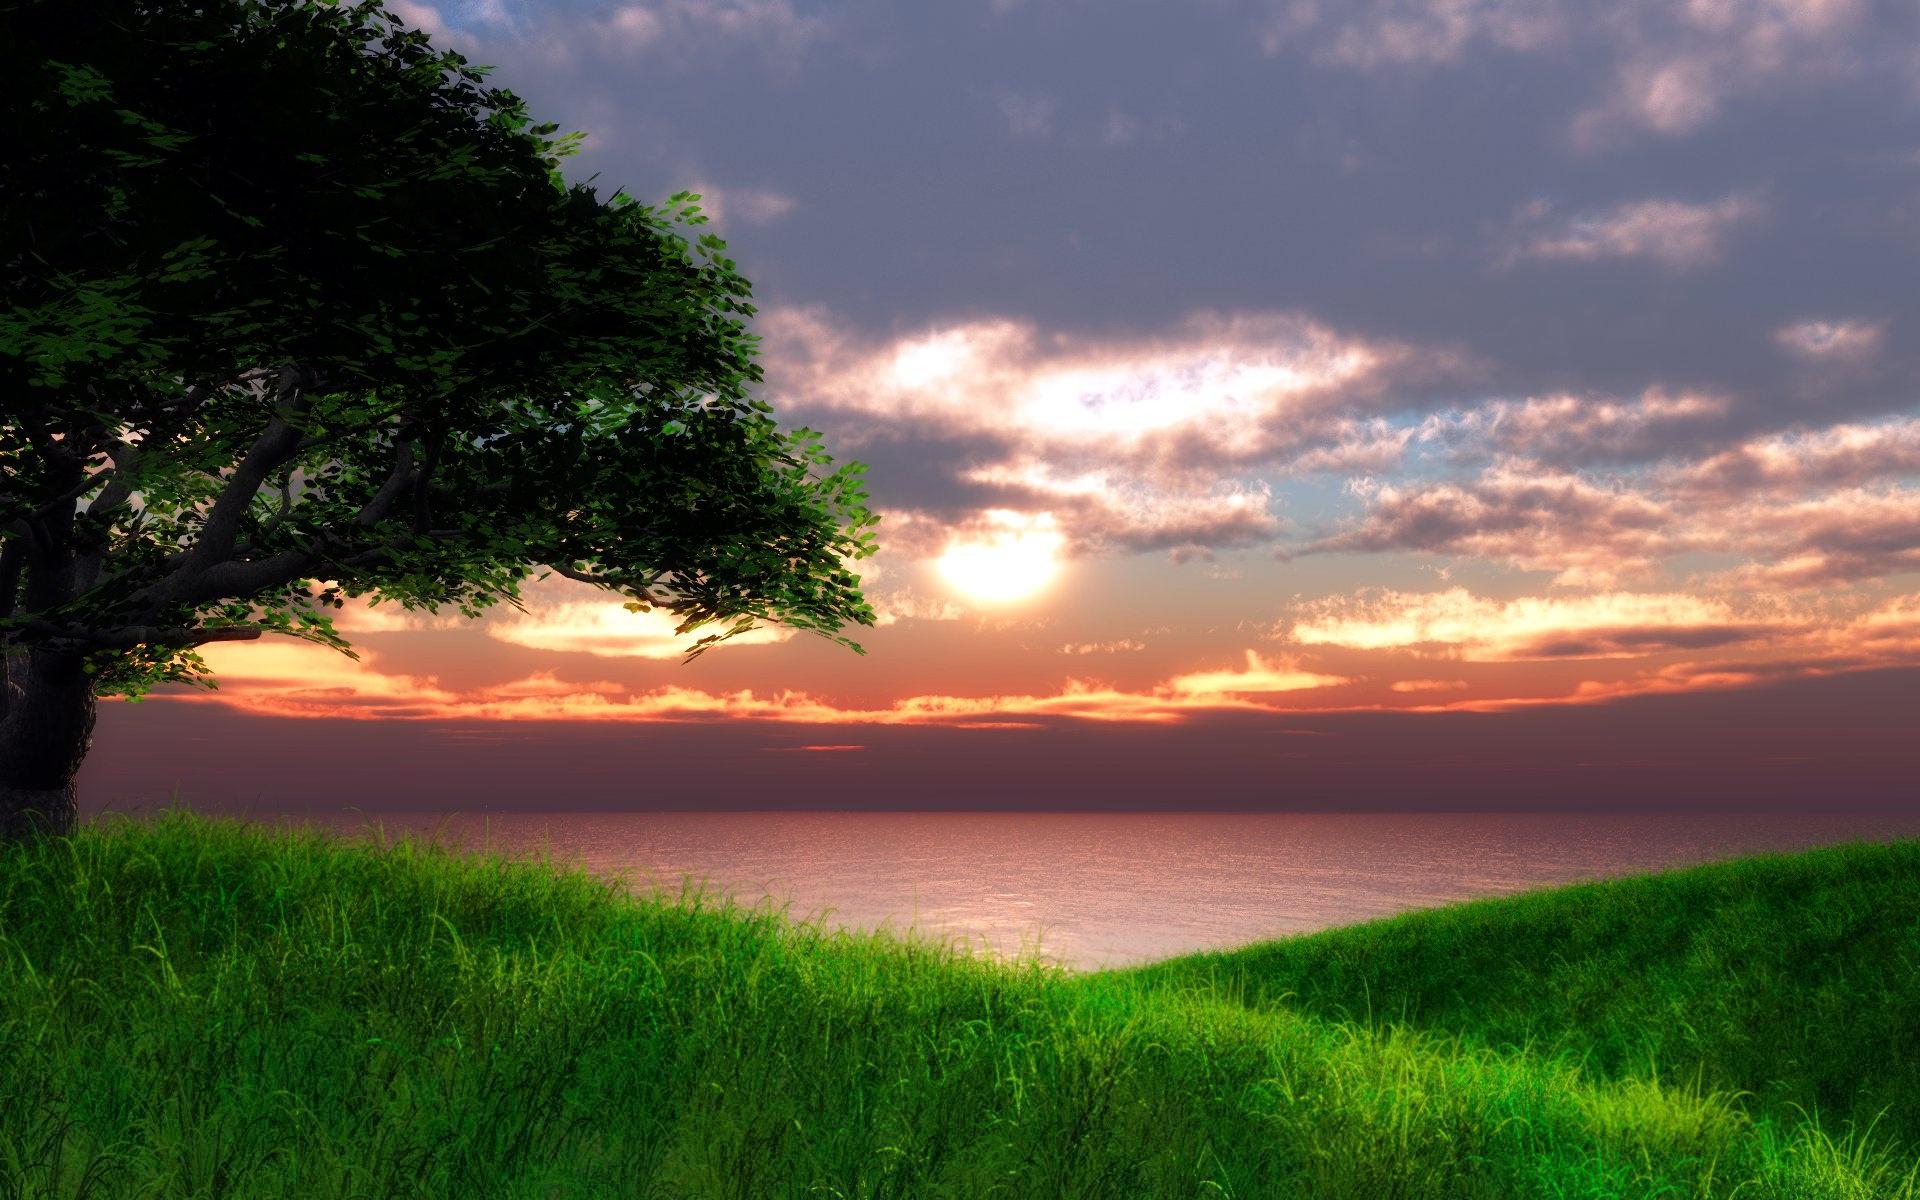 Sunset green landscape